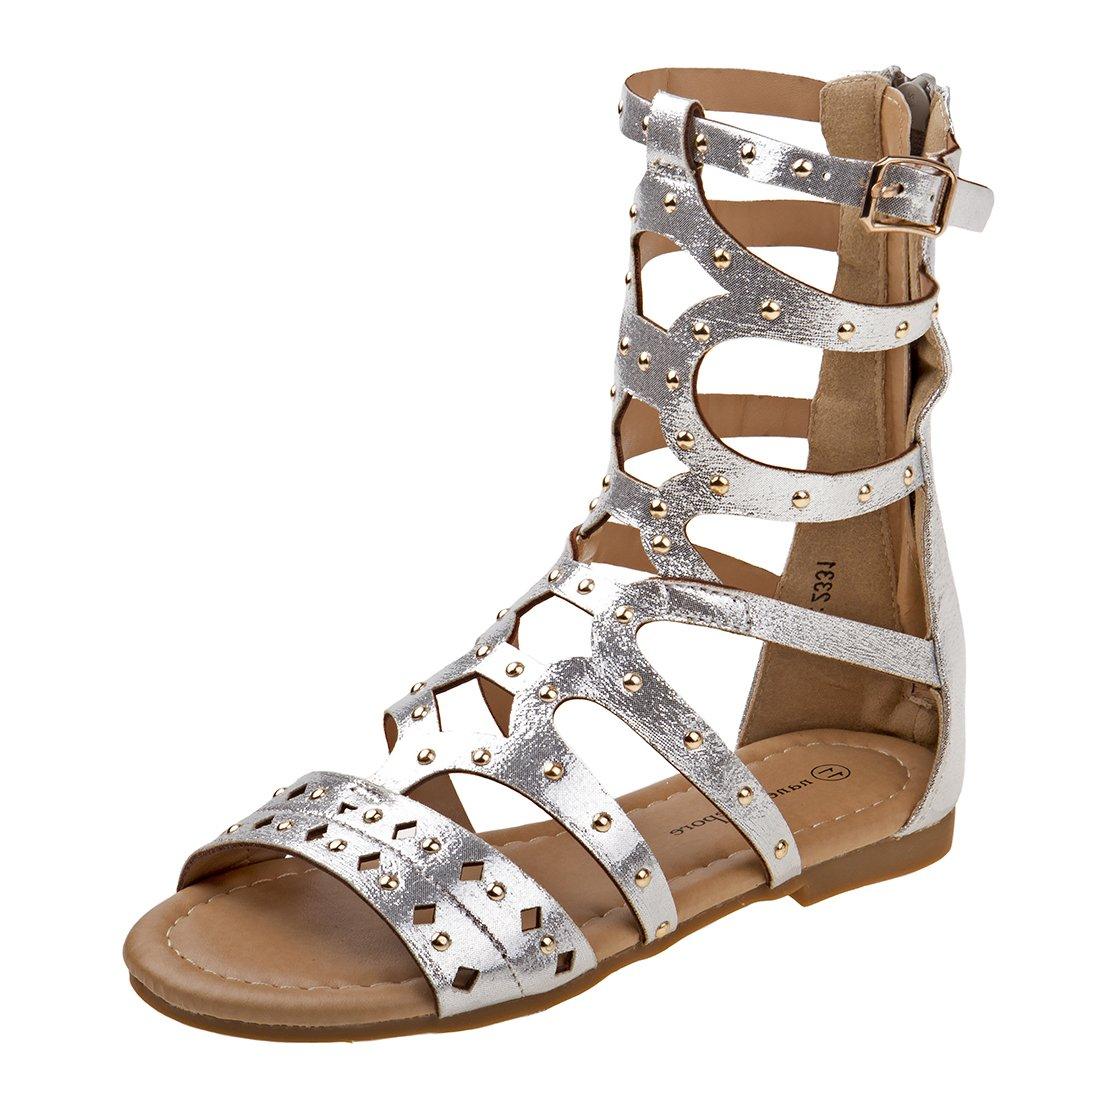 Nanette Lepore Girls Open Toe Gladiator Sandal With Studs, Silver, 13 M US Little Kid'